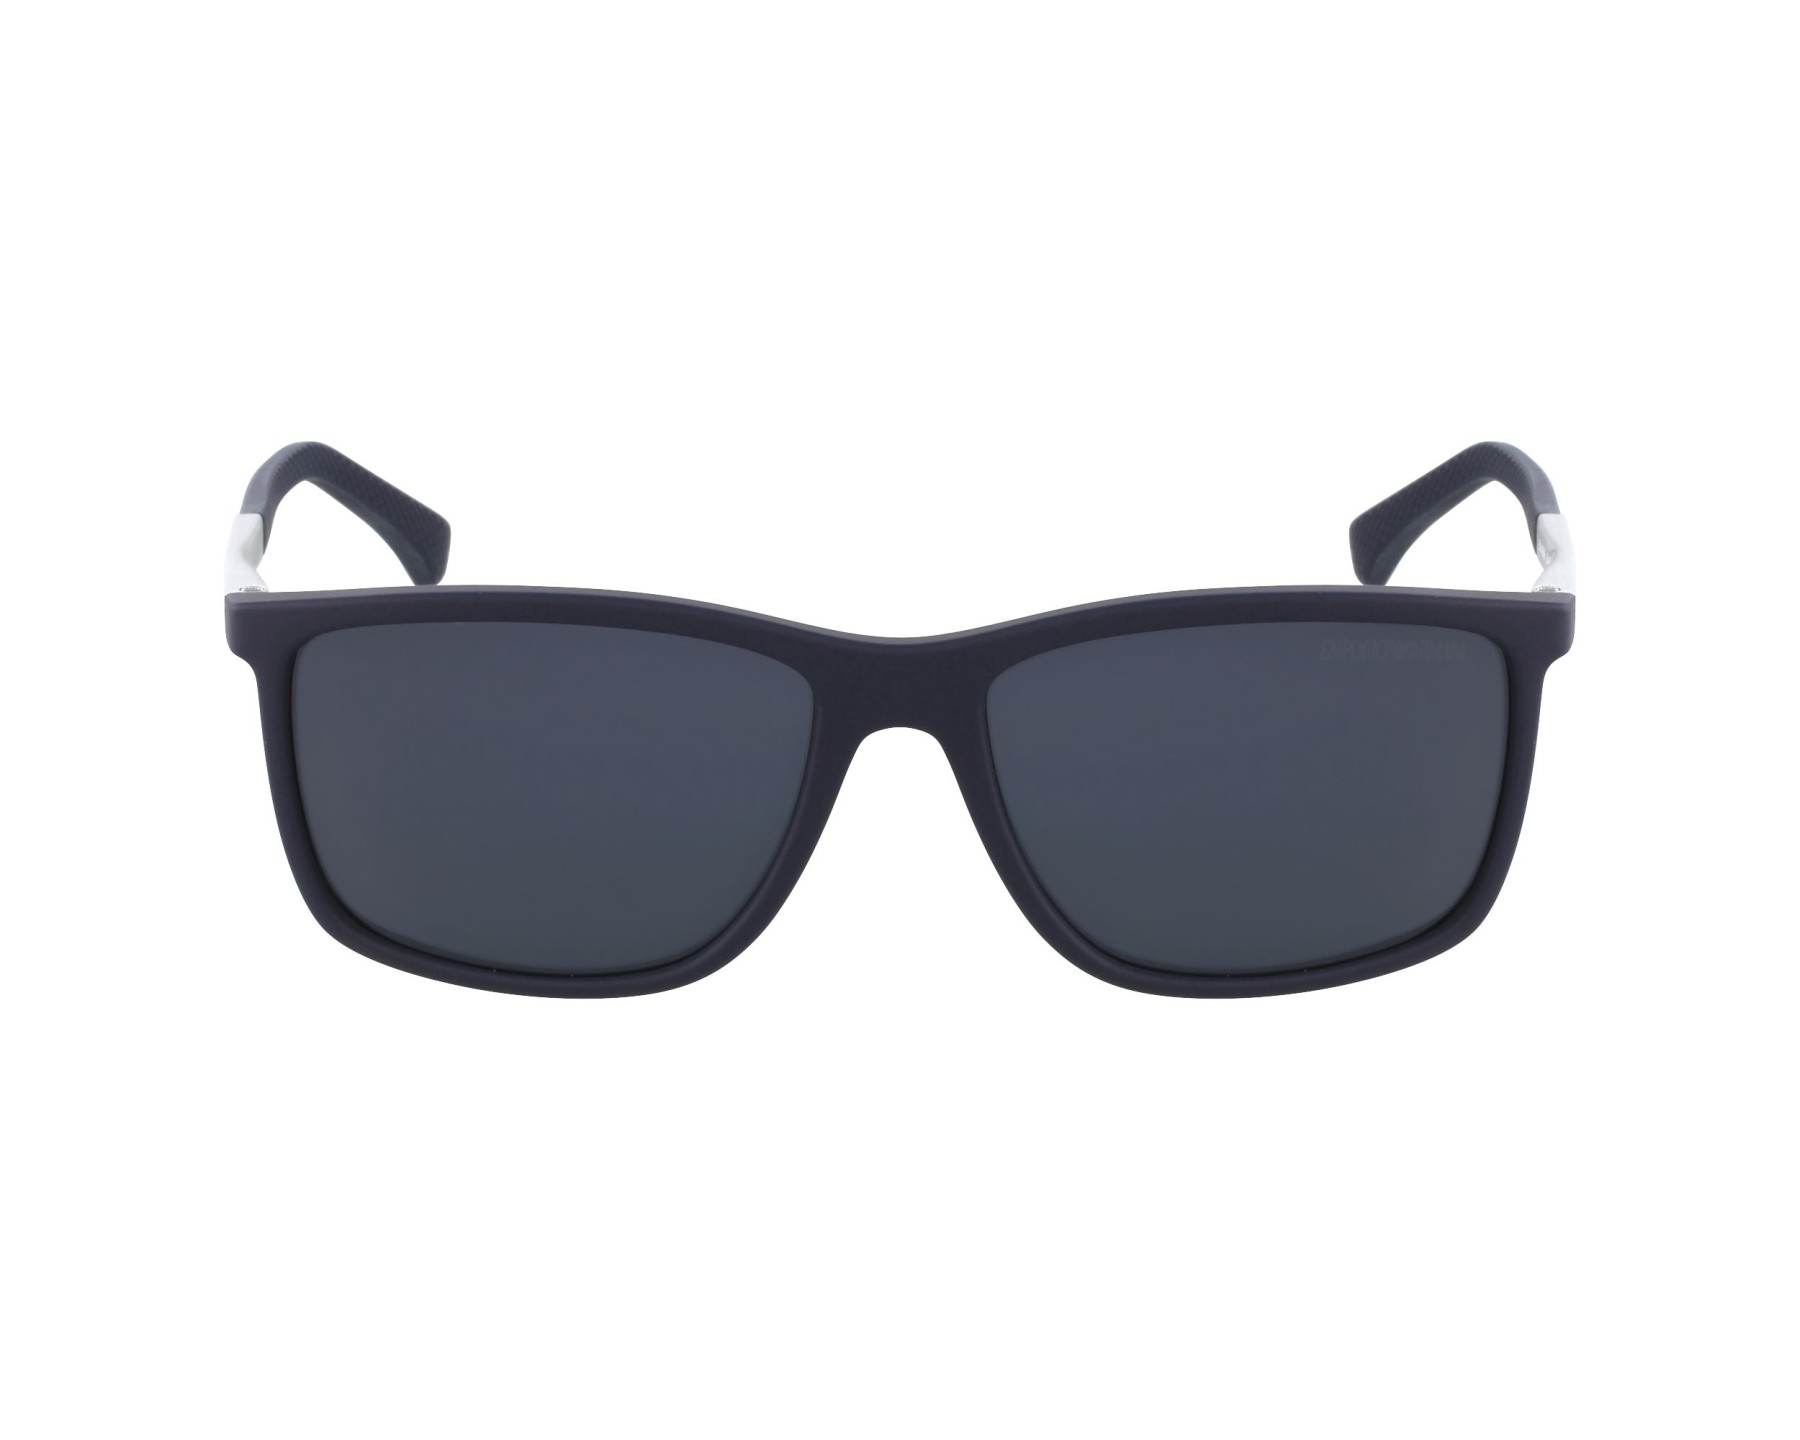 7ca168cf4c2a Armani Blue Lens Sunglasses